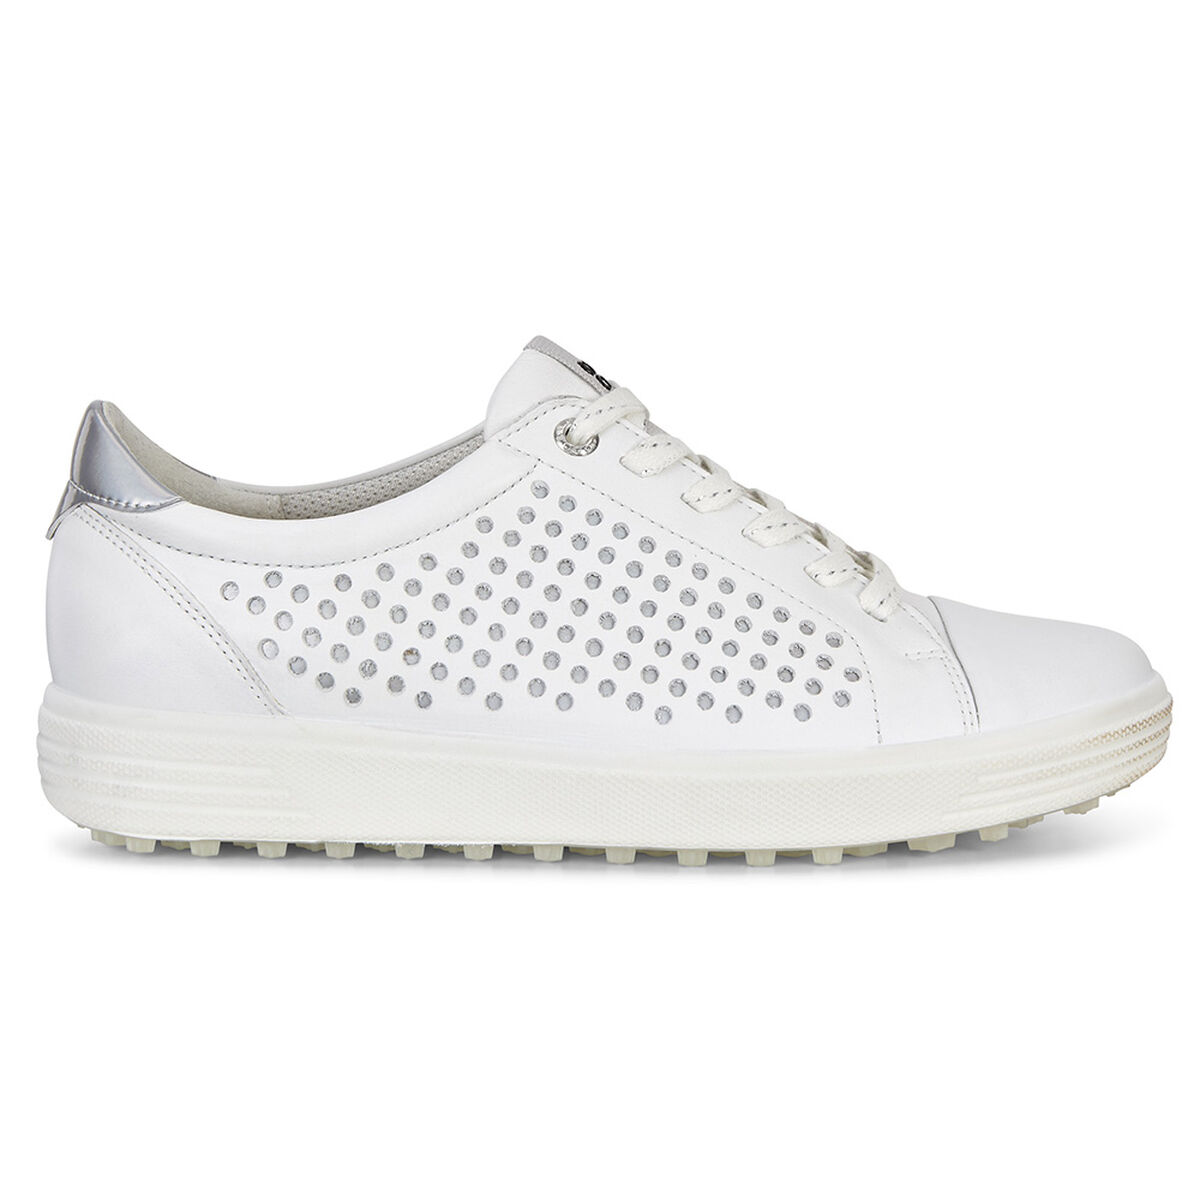 9353fb69d4 Casual Hybrid 2 Perf Women's Golf Shoe - White